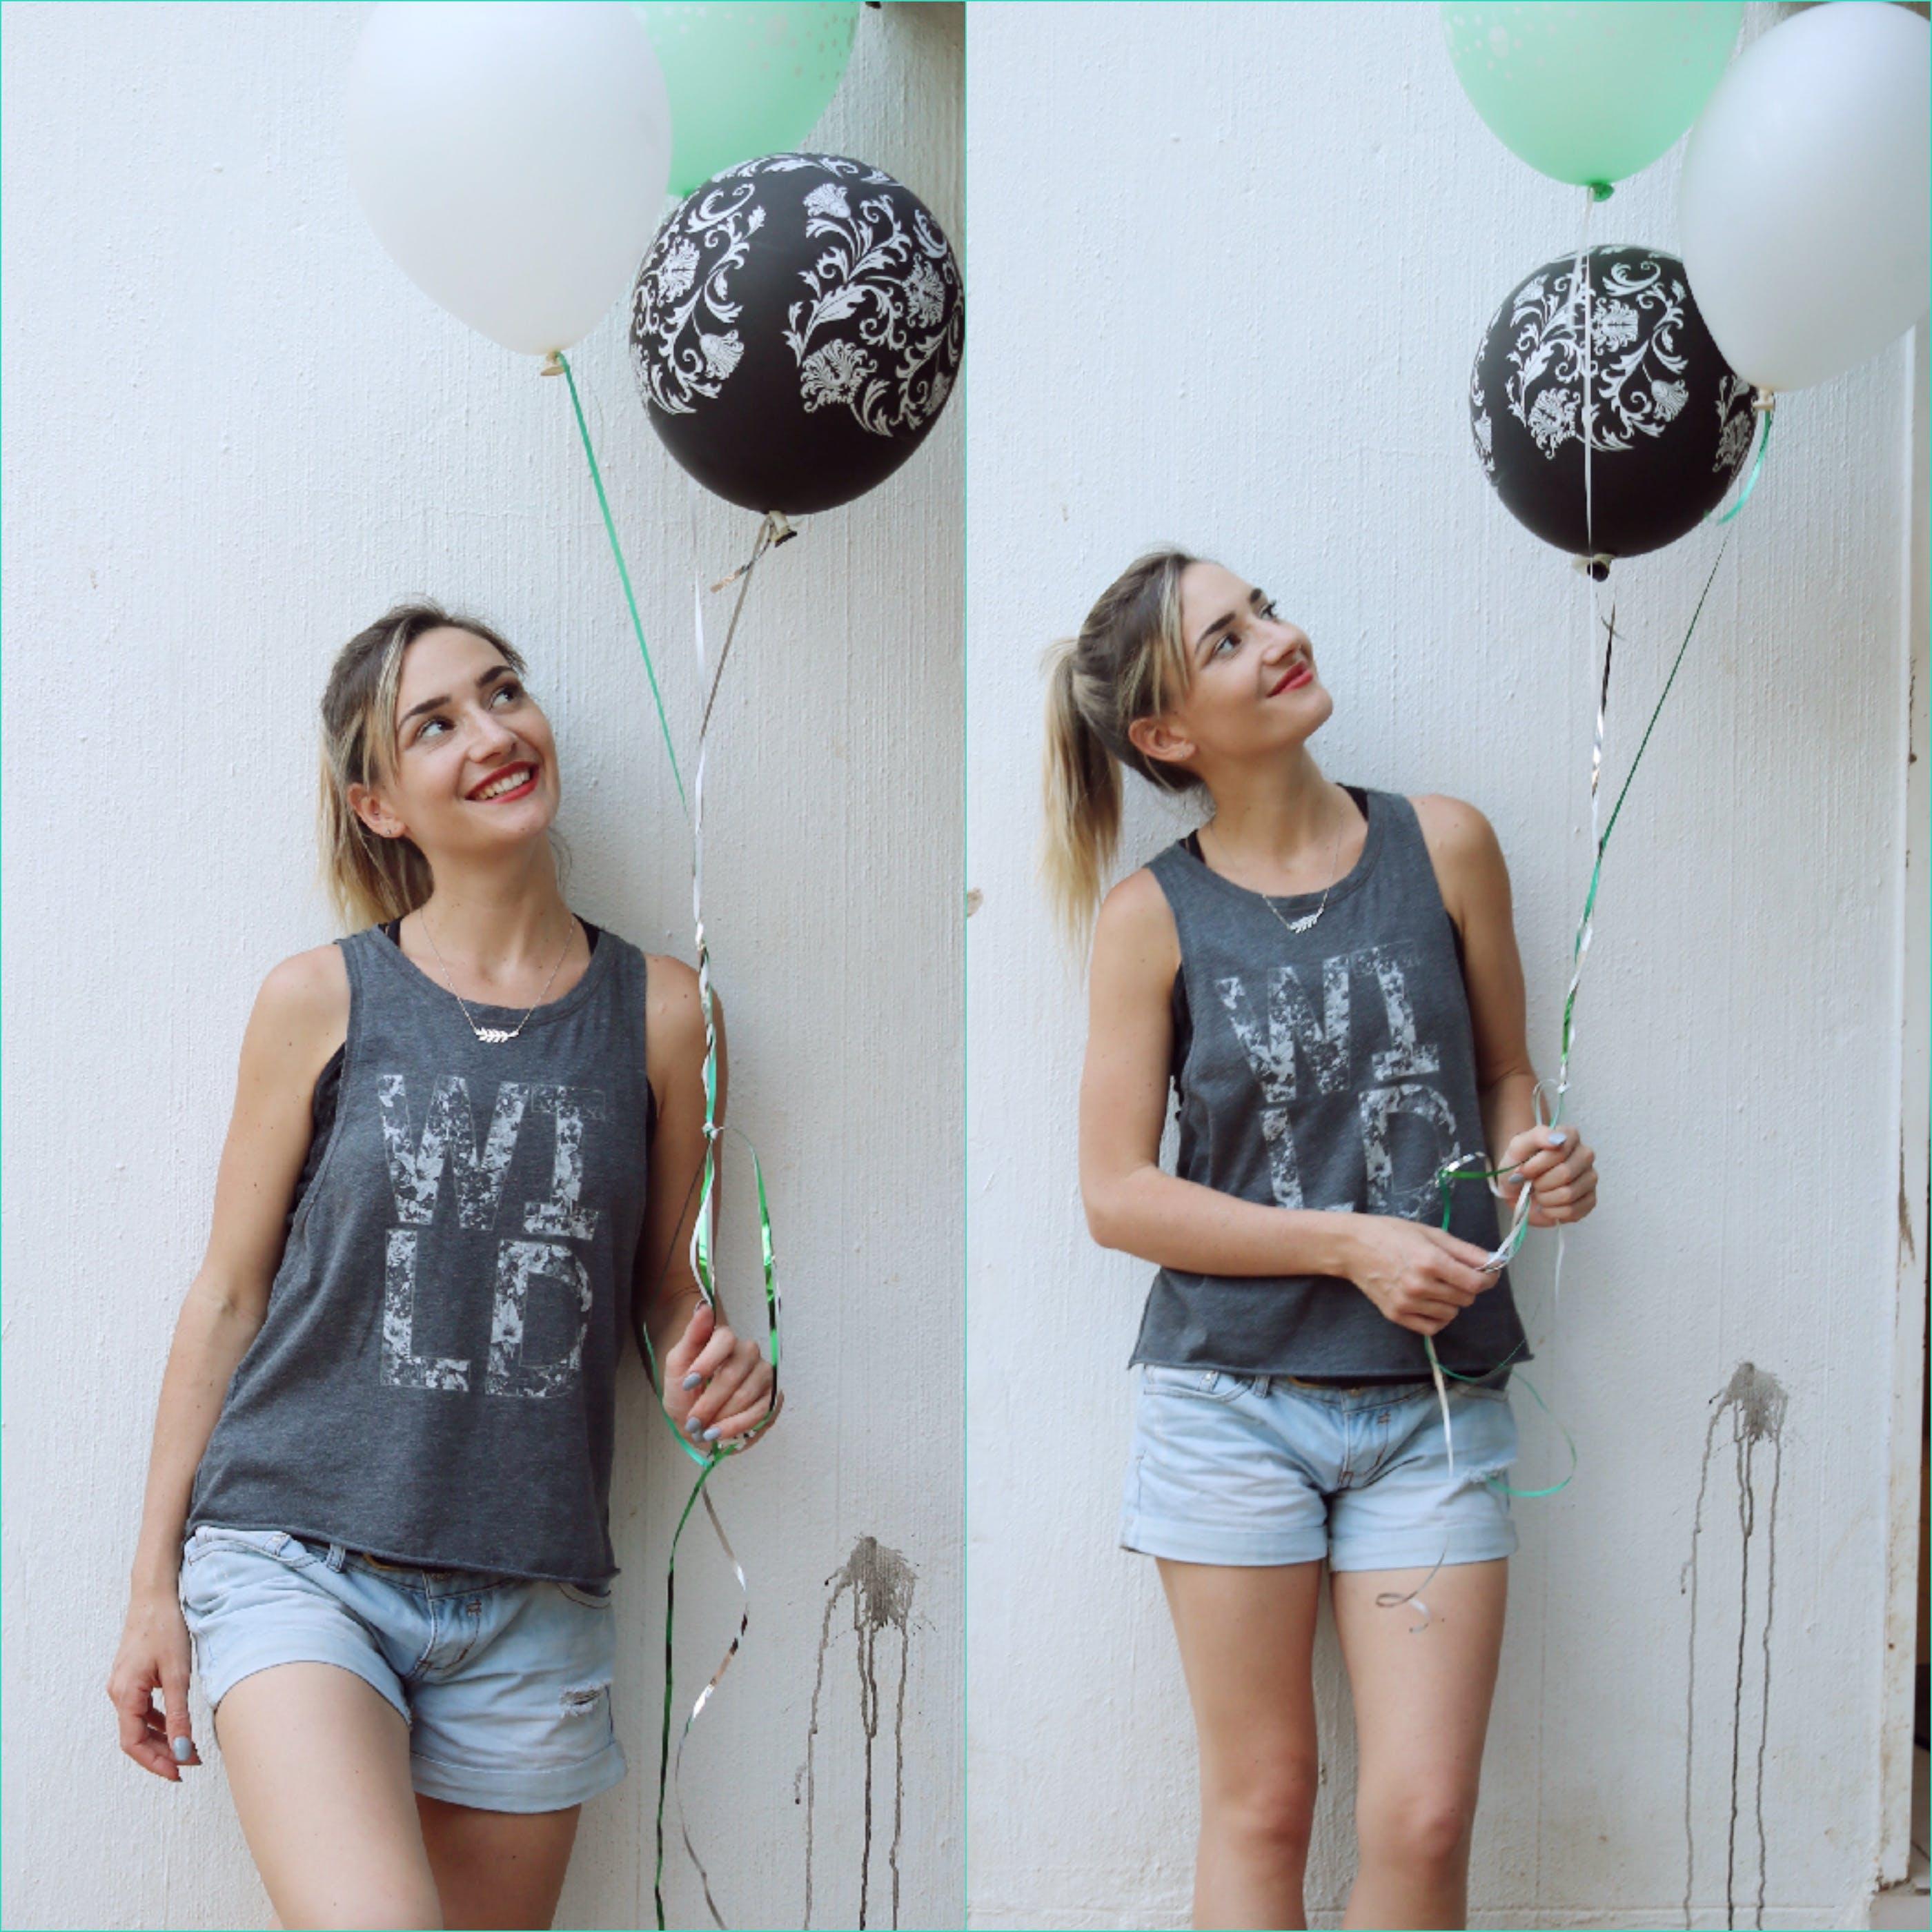 Free stock photo of adult, adulthood, balloons, birthday